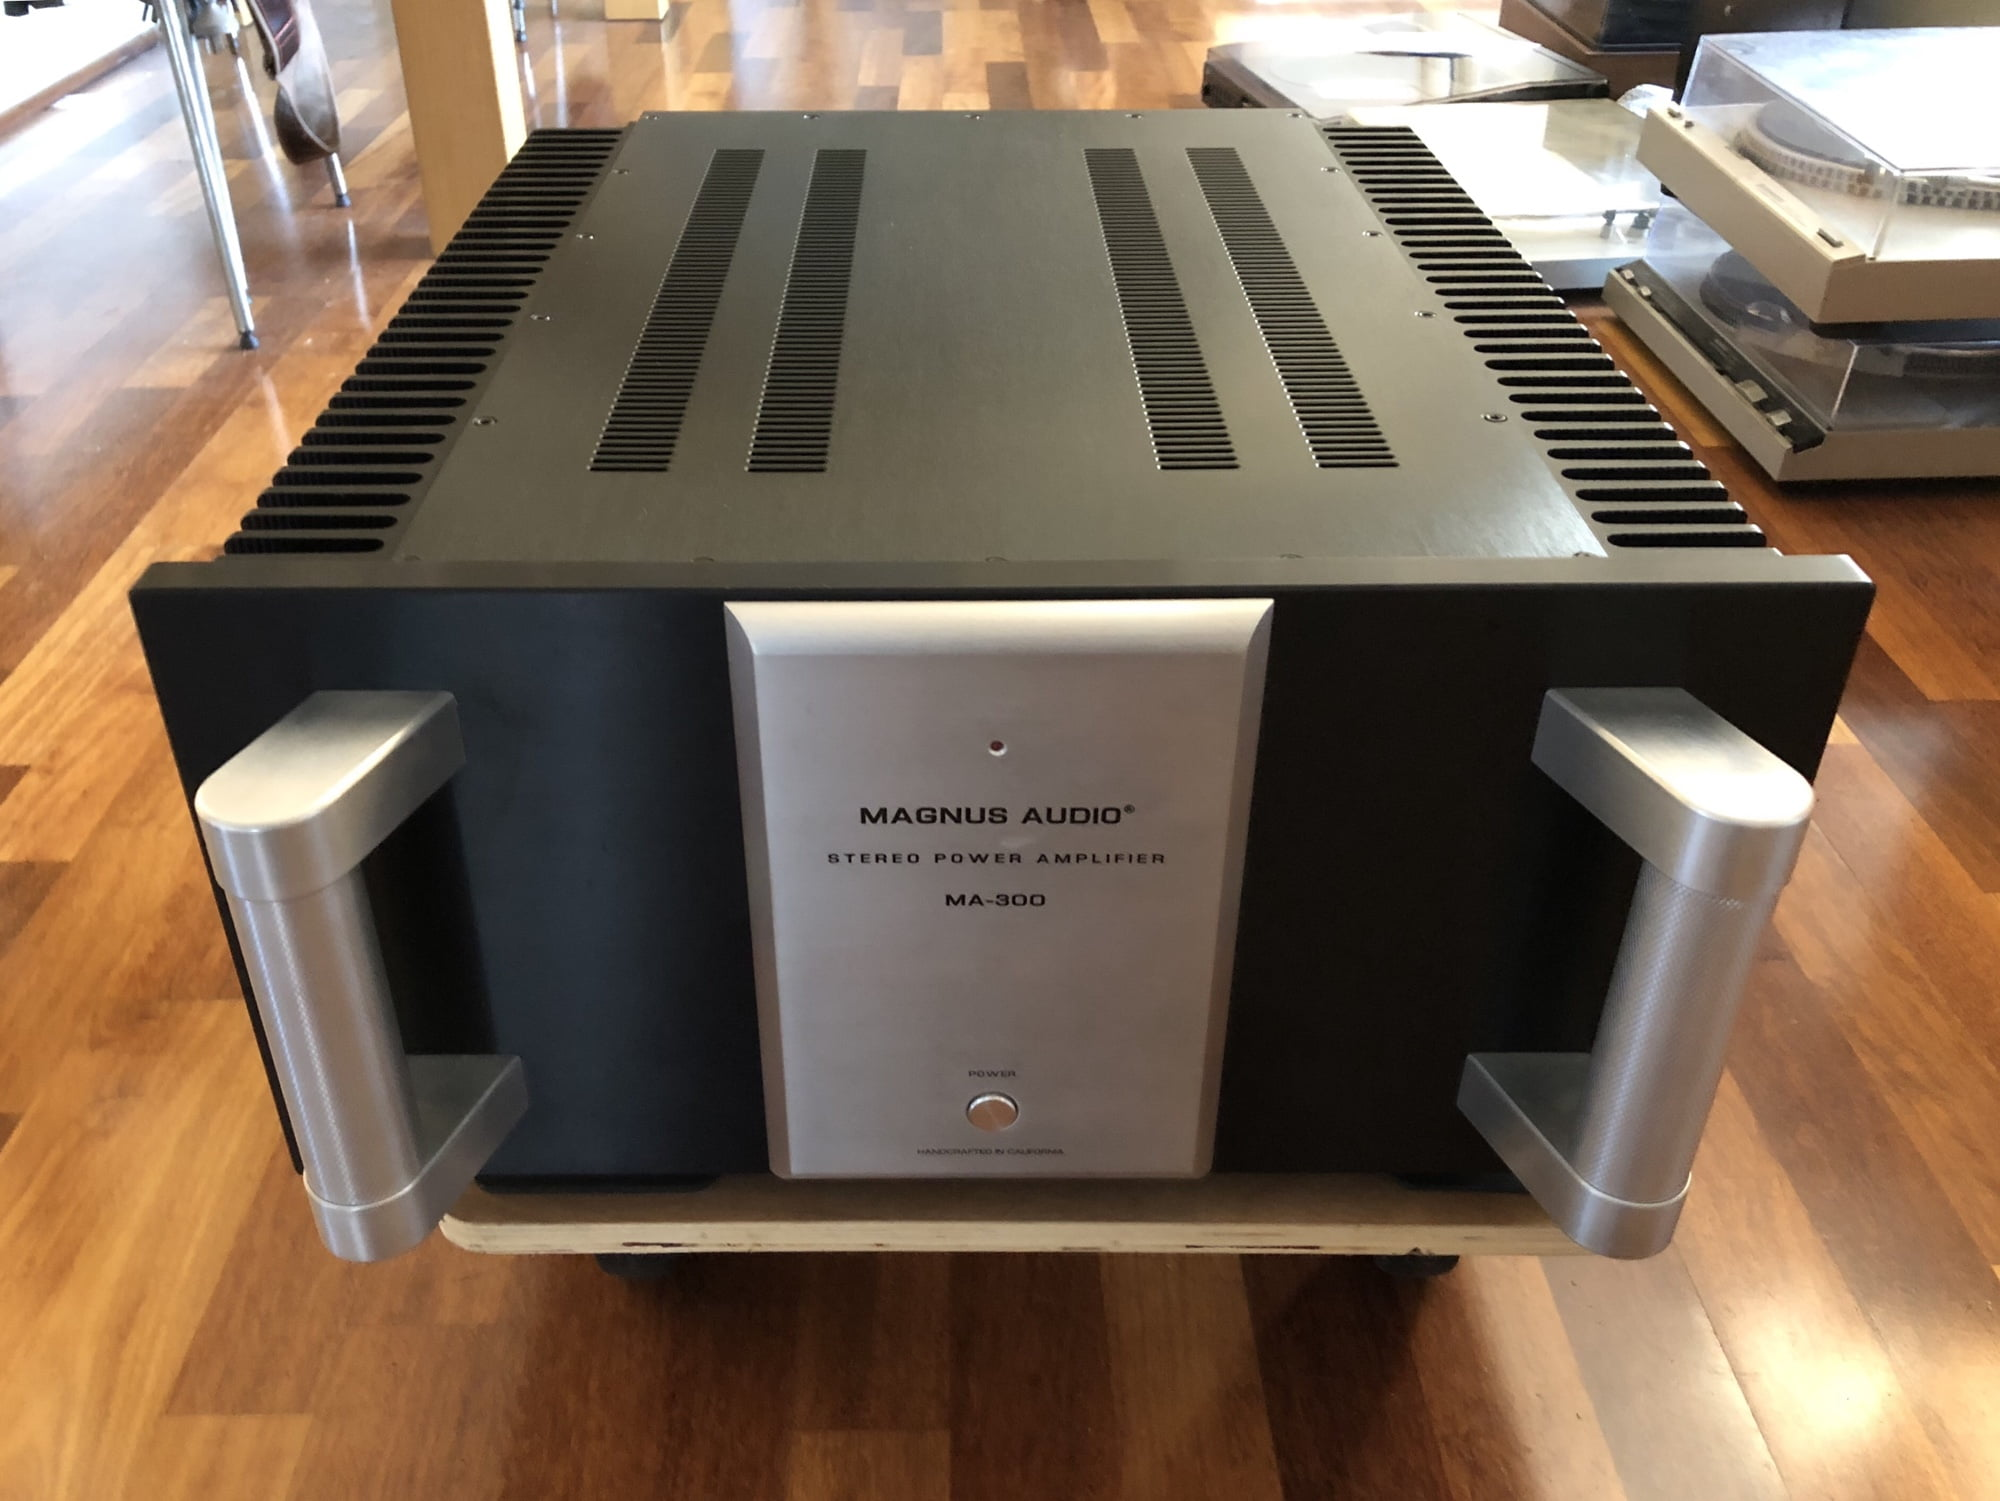 Magnus Audio MA-300 Monster Amplifier Upgrade